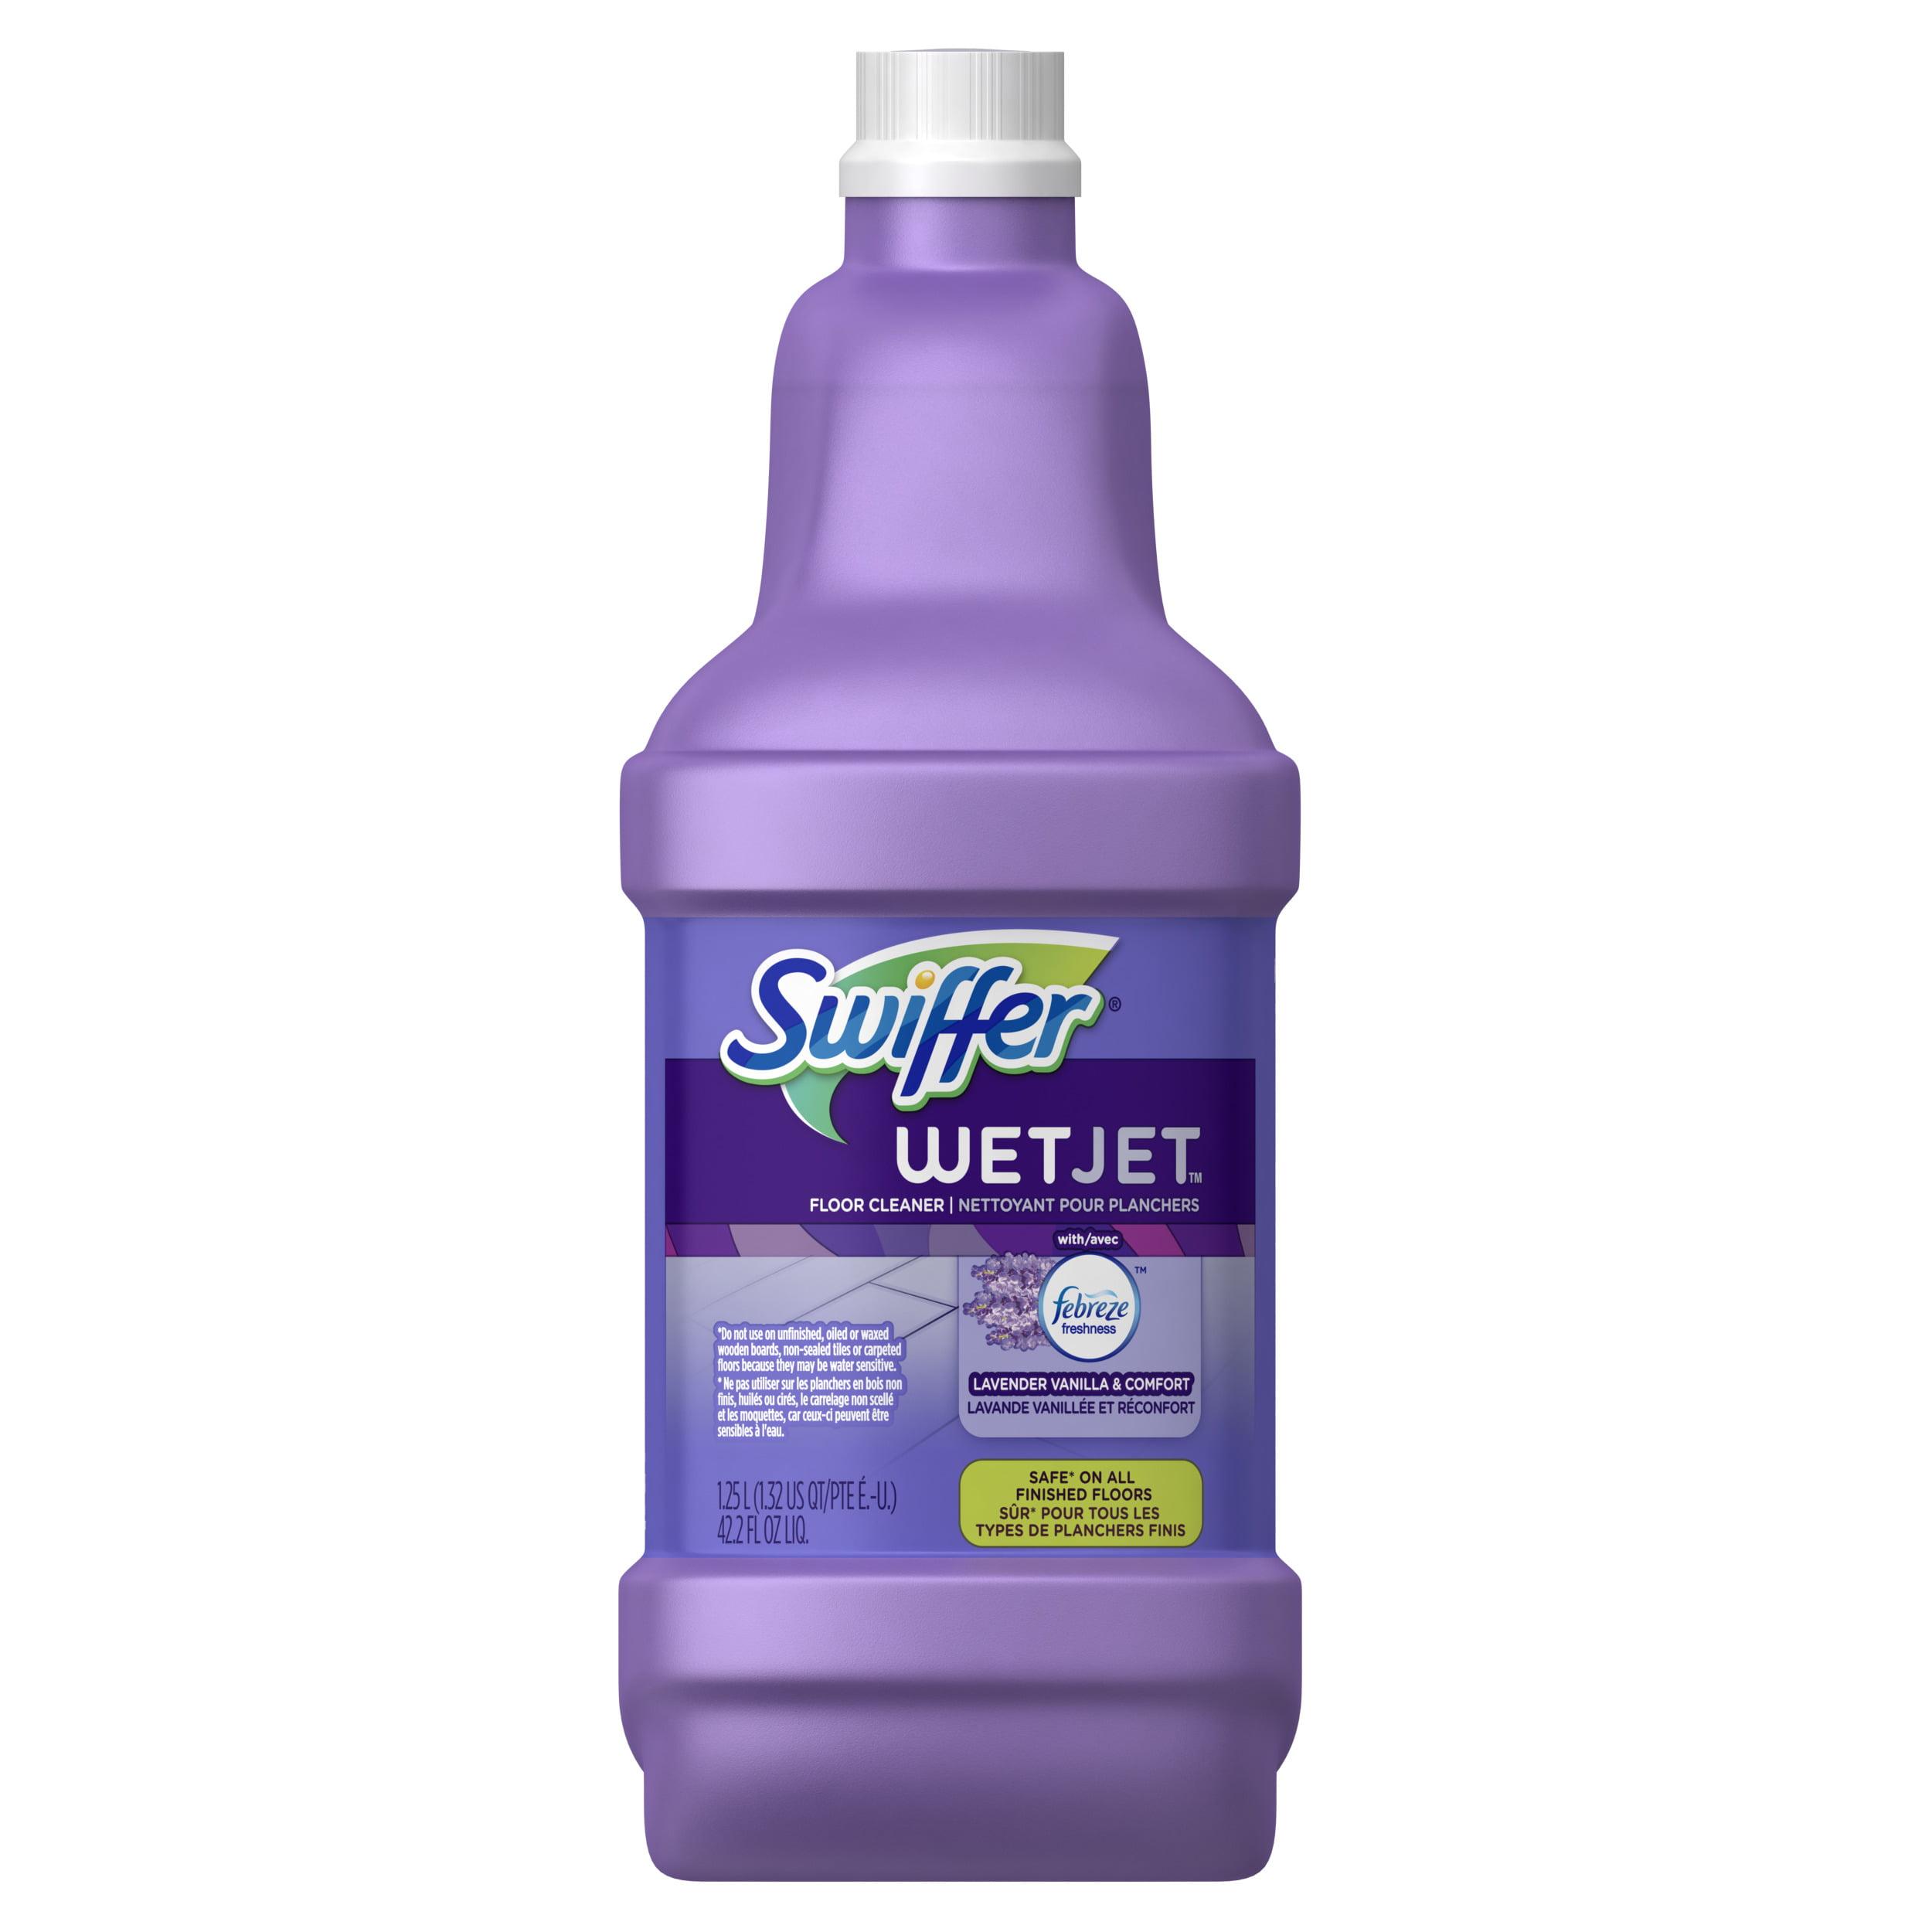 Swiffer WetJet Multi-Purpose and Hardwood Liquid Floor Cleaner Solution Refill, Lavender Vanilla & Comfort, 42.2 fl oz